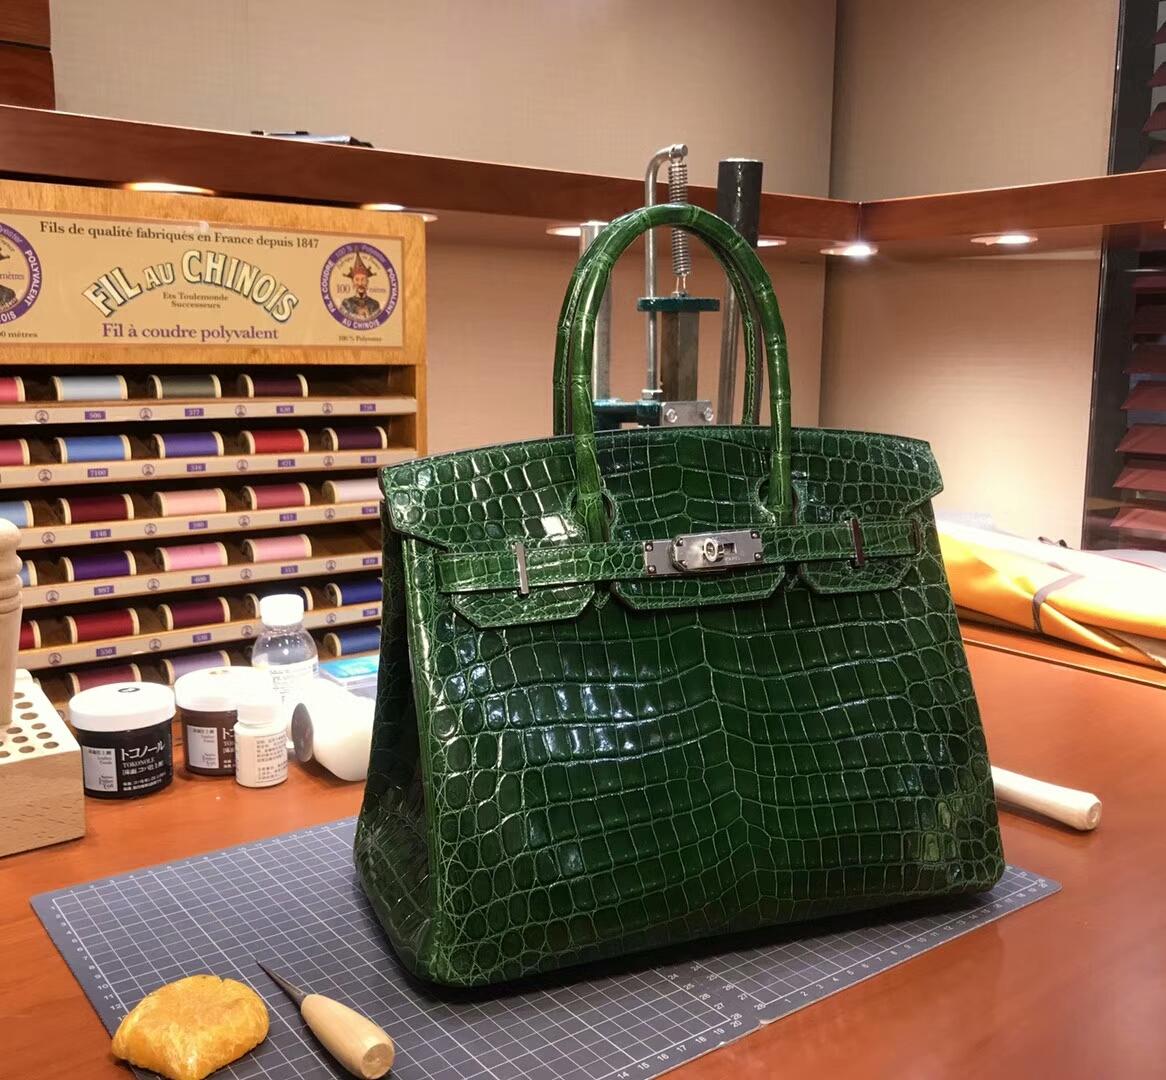 CK67VertFonce祖母绿 爱马仕 HERMES 铂金包 Birkin 配全套专柜原版包装 全球发售